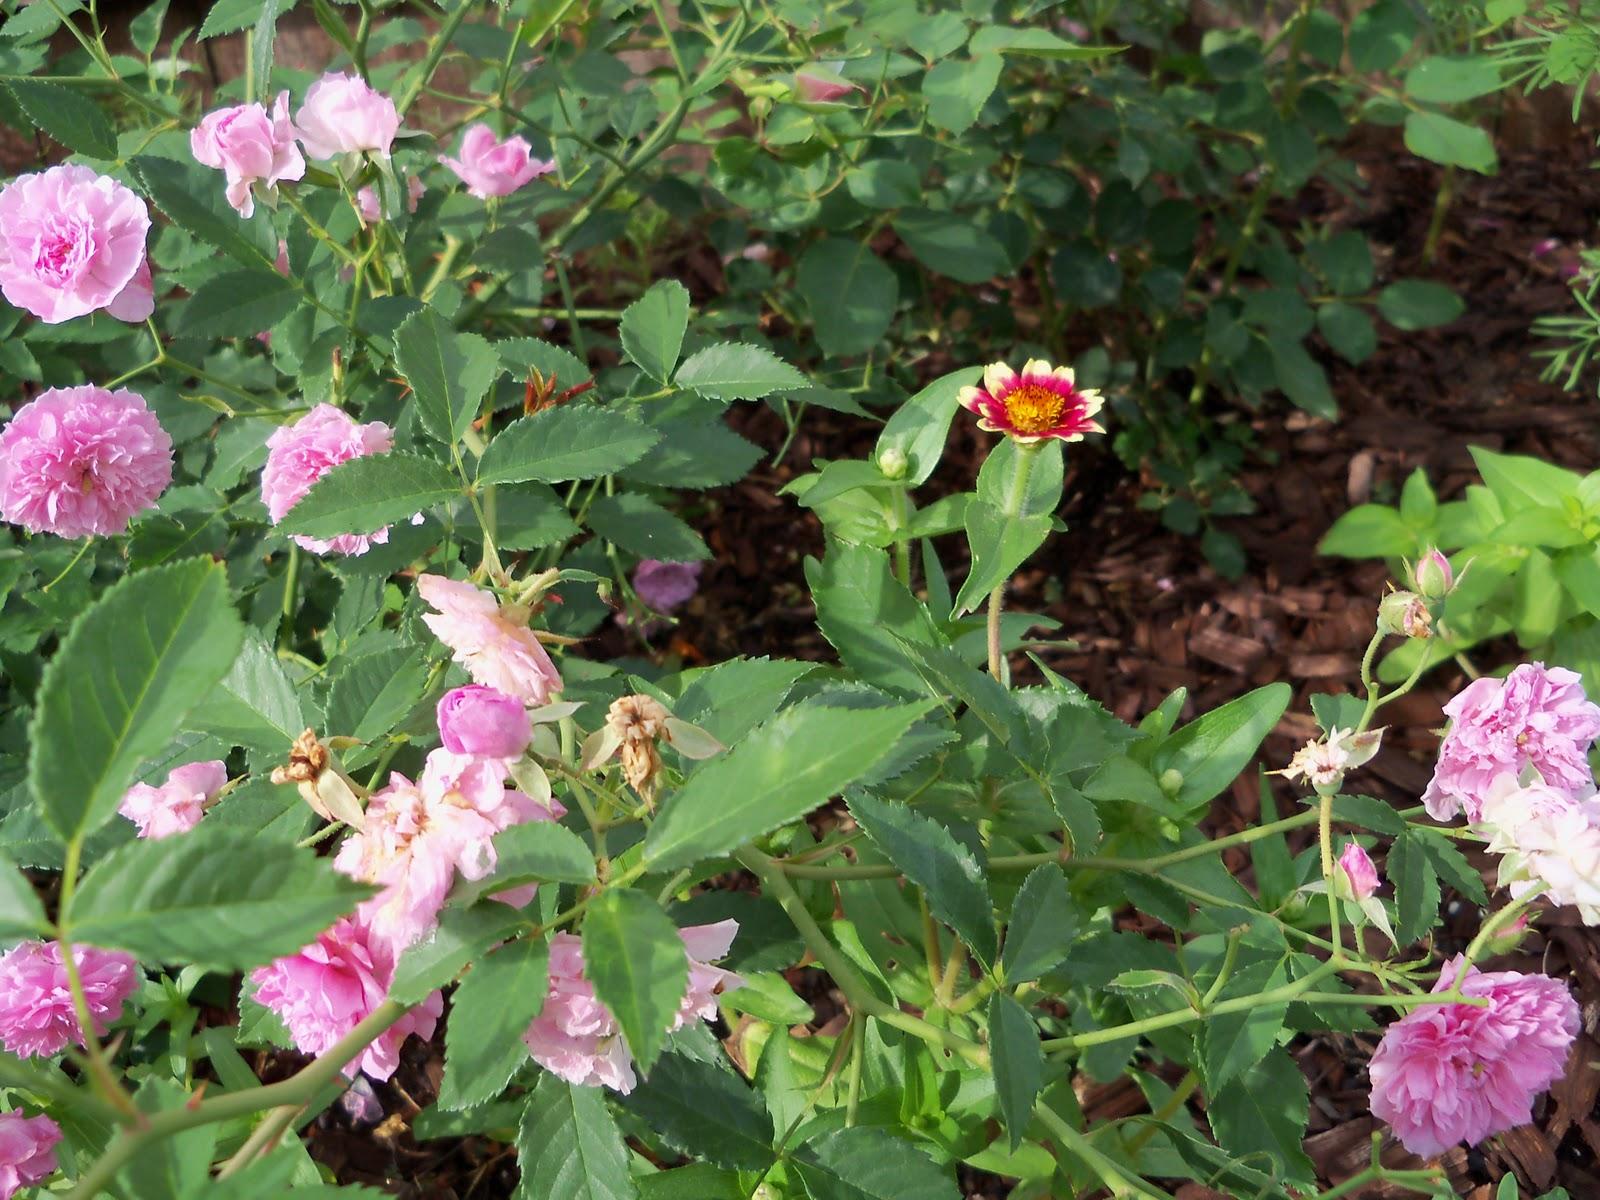 Gardening 2010, Part Two - 101_2209.JPG